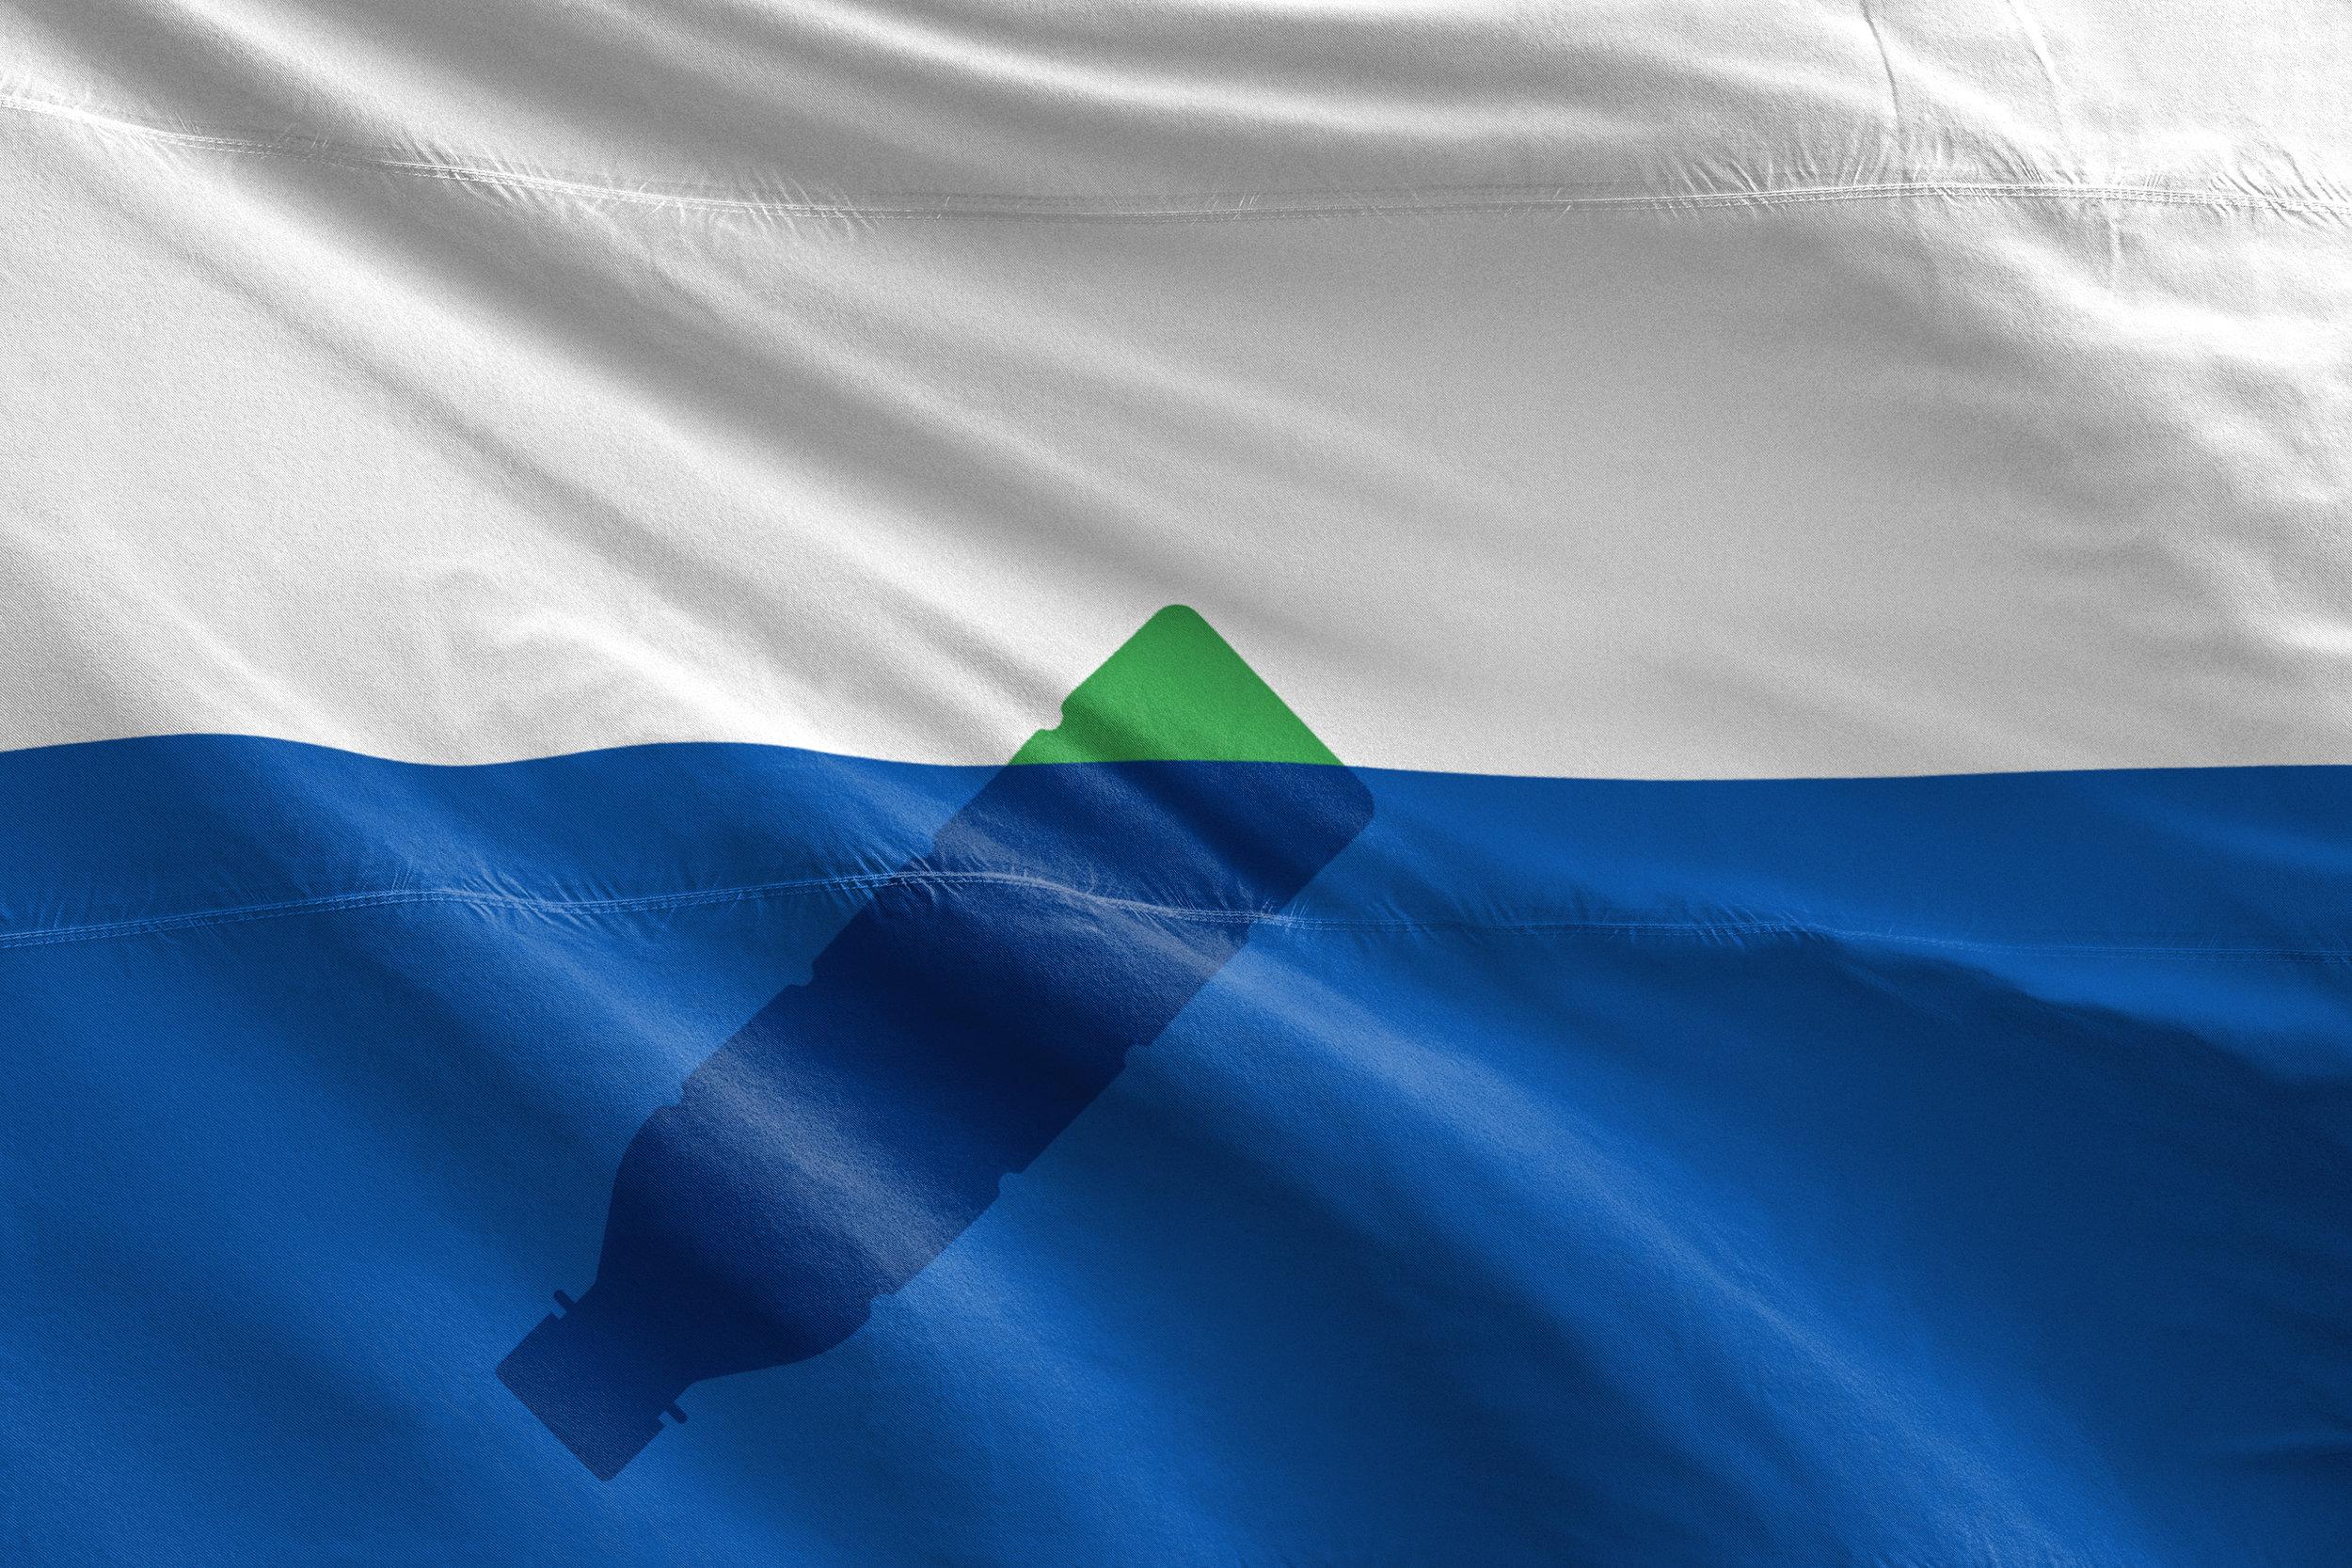 The Trash Isles flag, designed by Mario Kerkstra